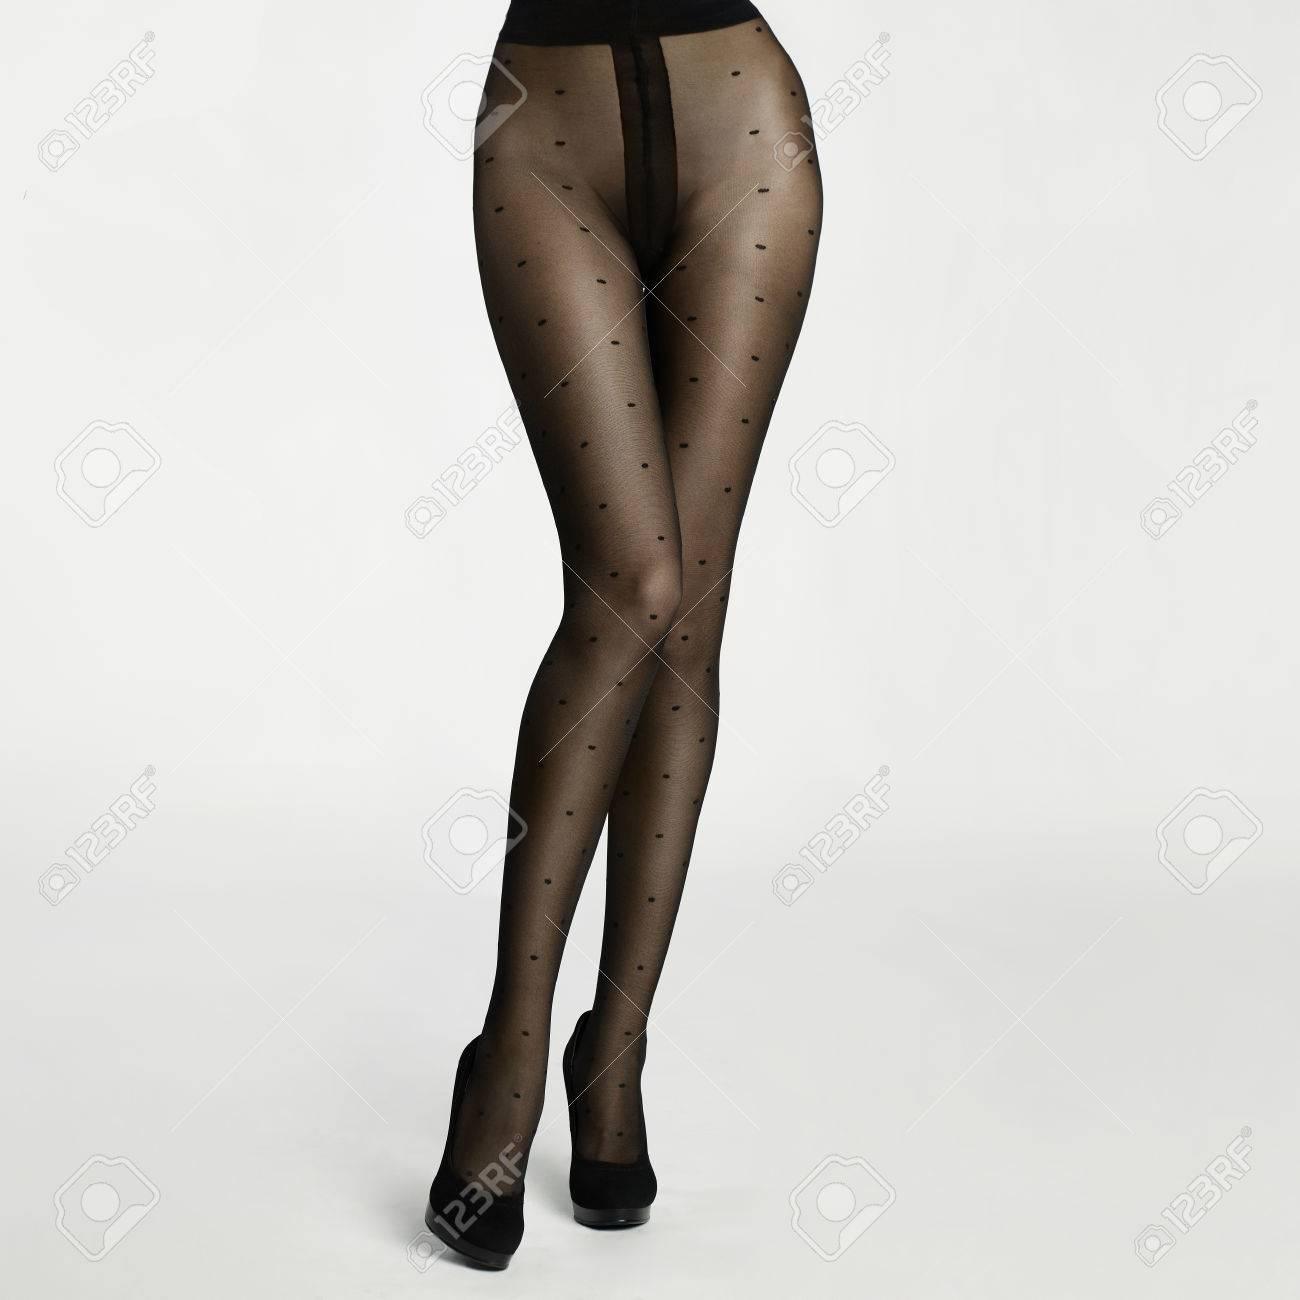 Slim Female Legs In Pantyhose Conceptual Fashion Art Photo Stock Photo 33287239